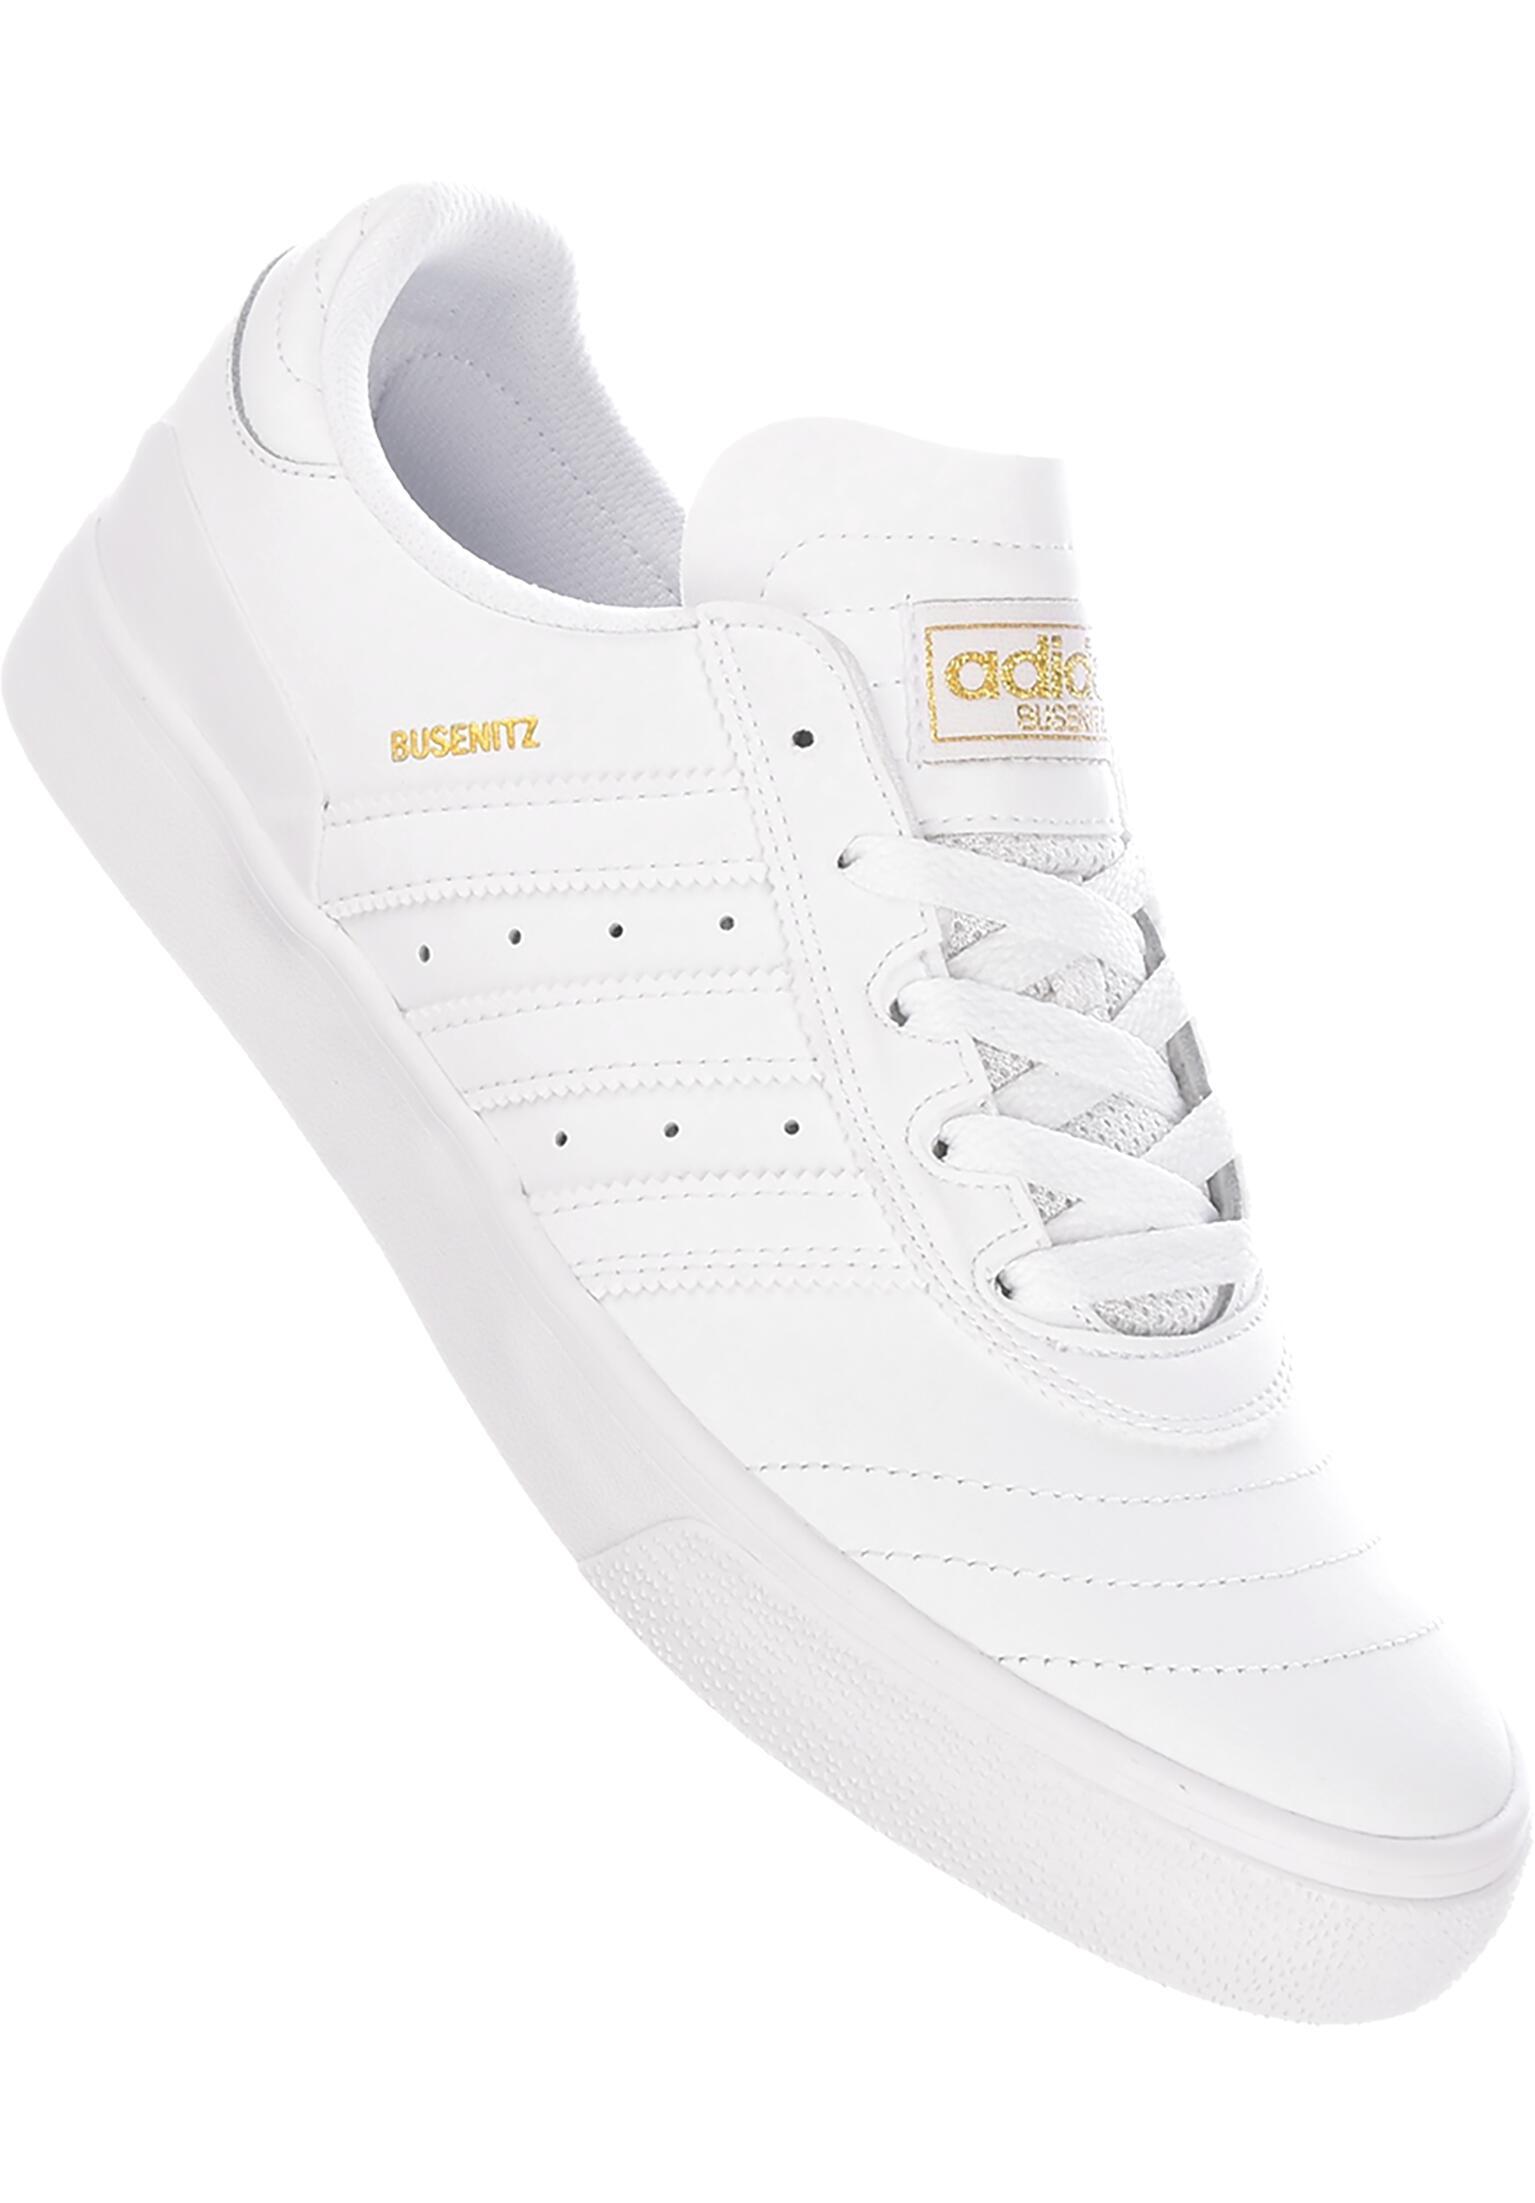 finest selection ee17f 5c5be Busenitz Vulc ADV adidas-skateboarding Tutte le scarpe in white-white-gold  da Uomo   Titus